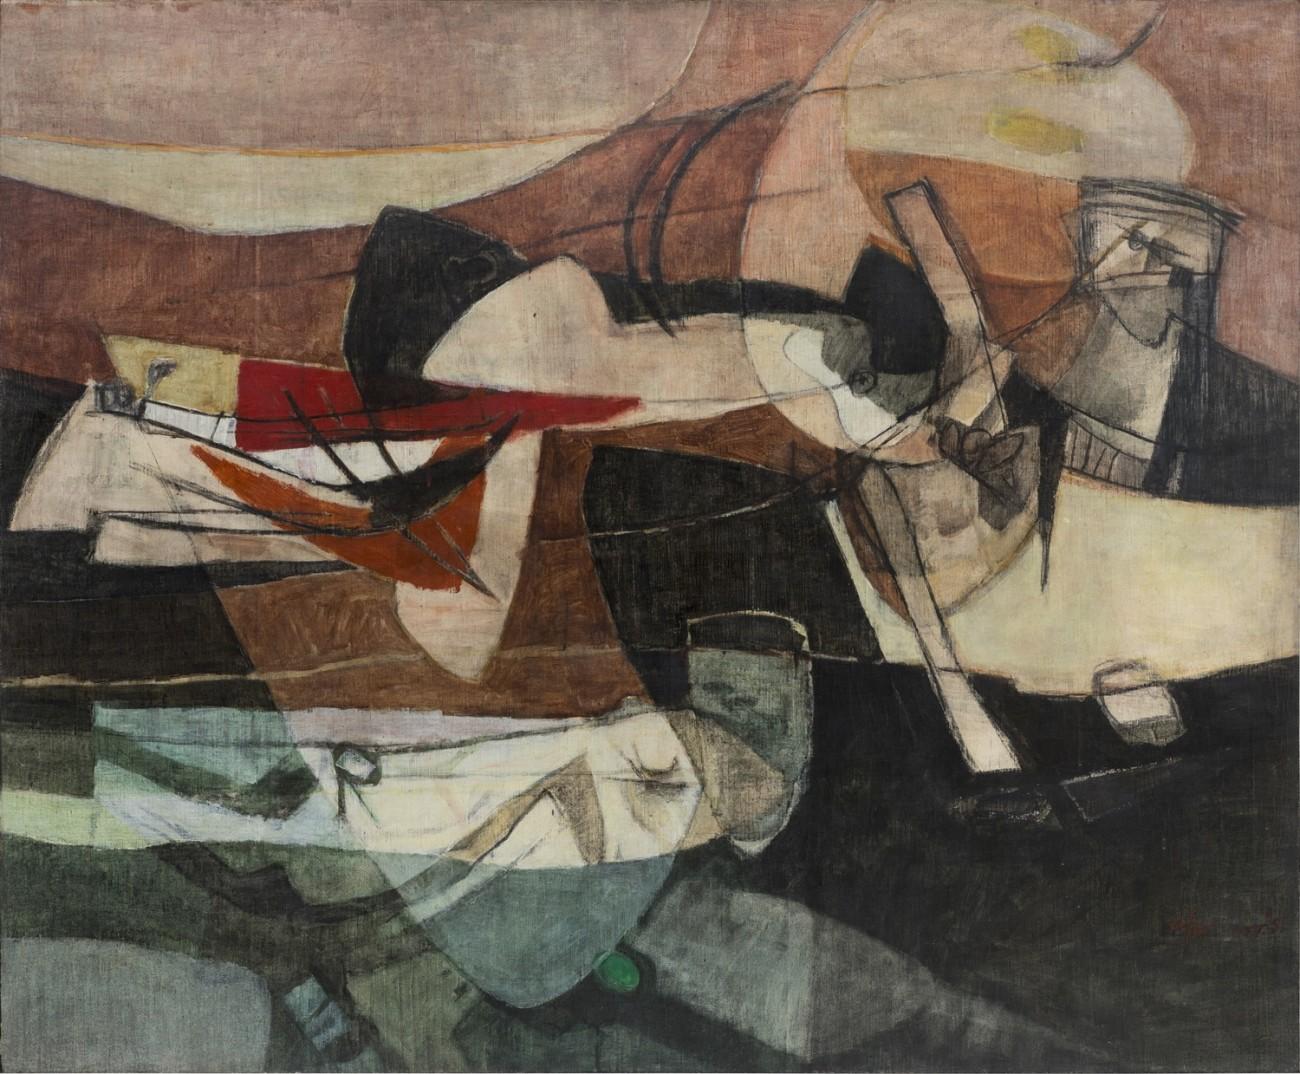 In SHAnGHAI, 'RoMA 1950 -1960'